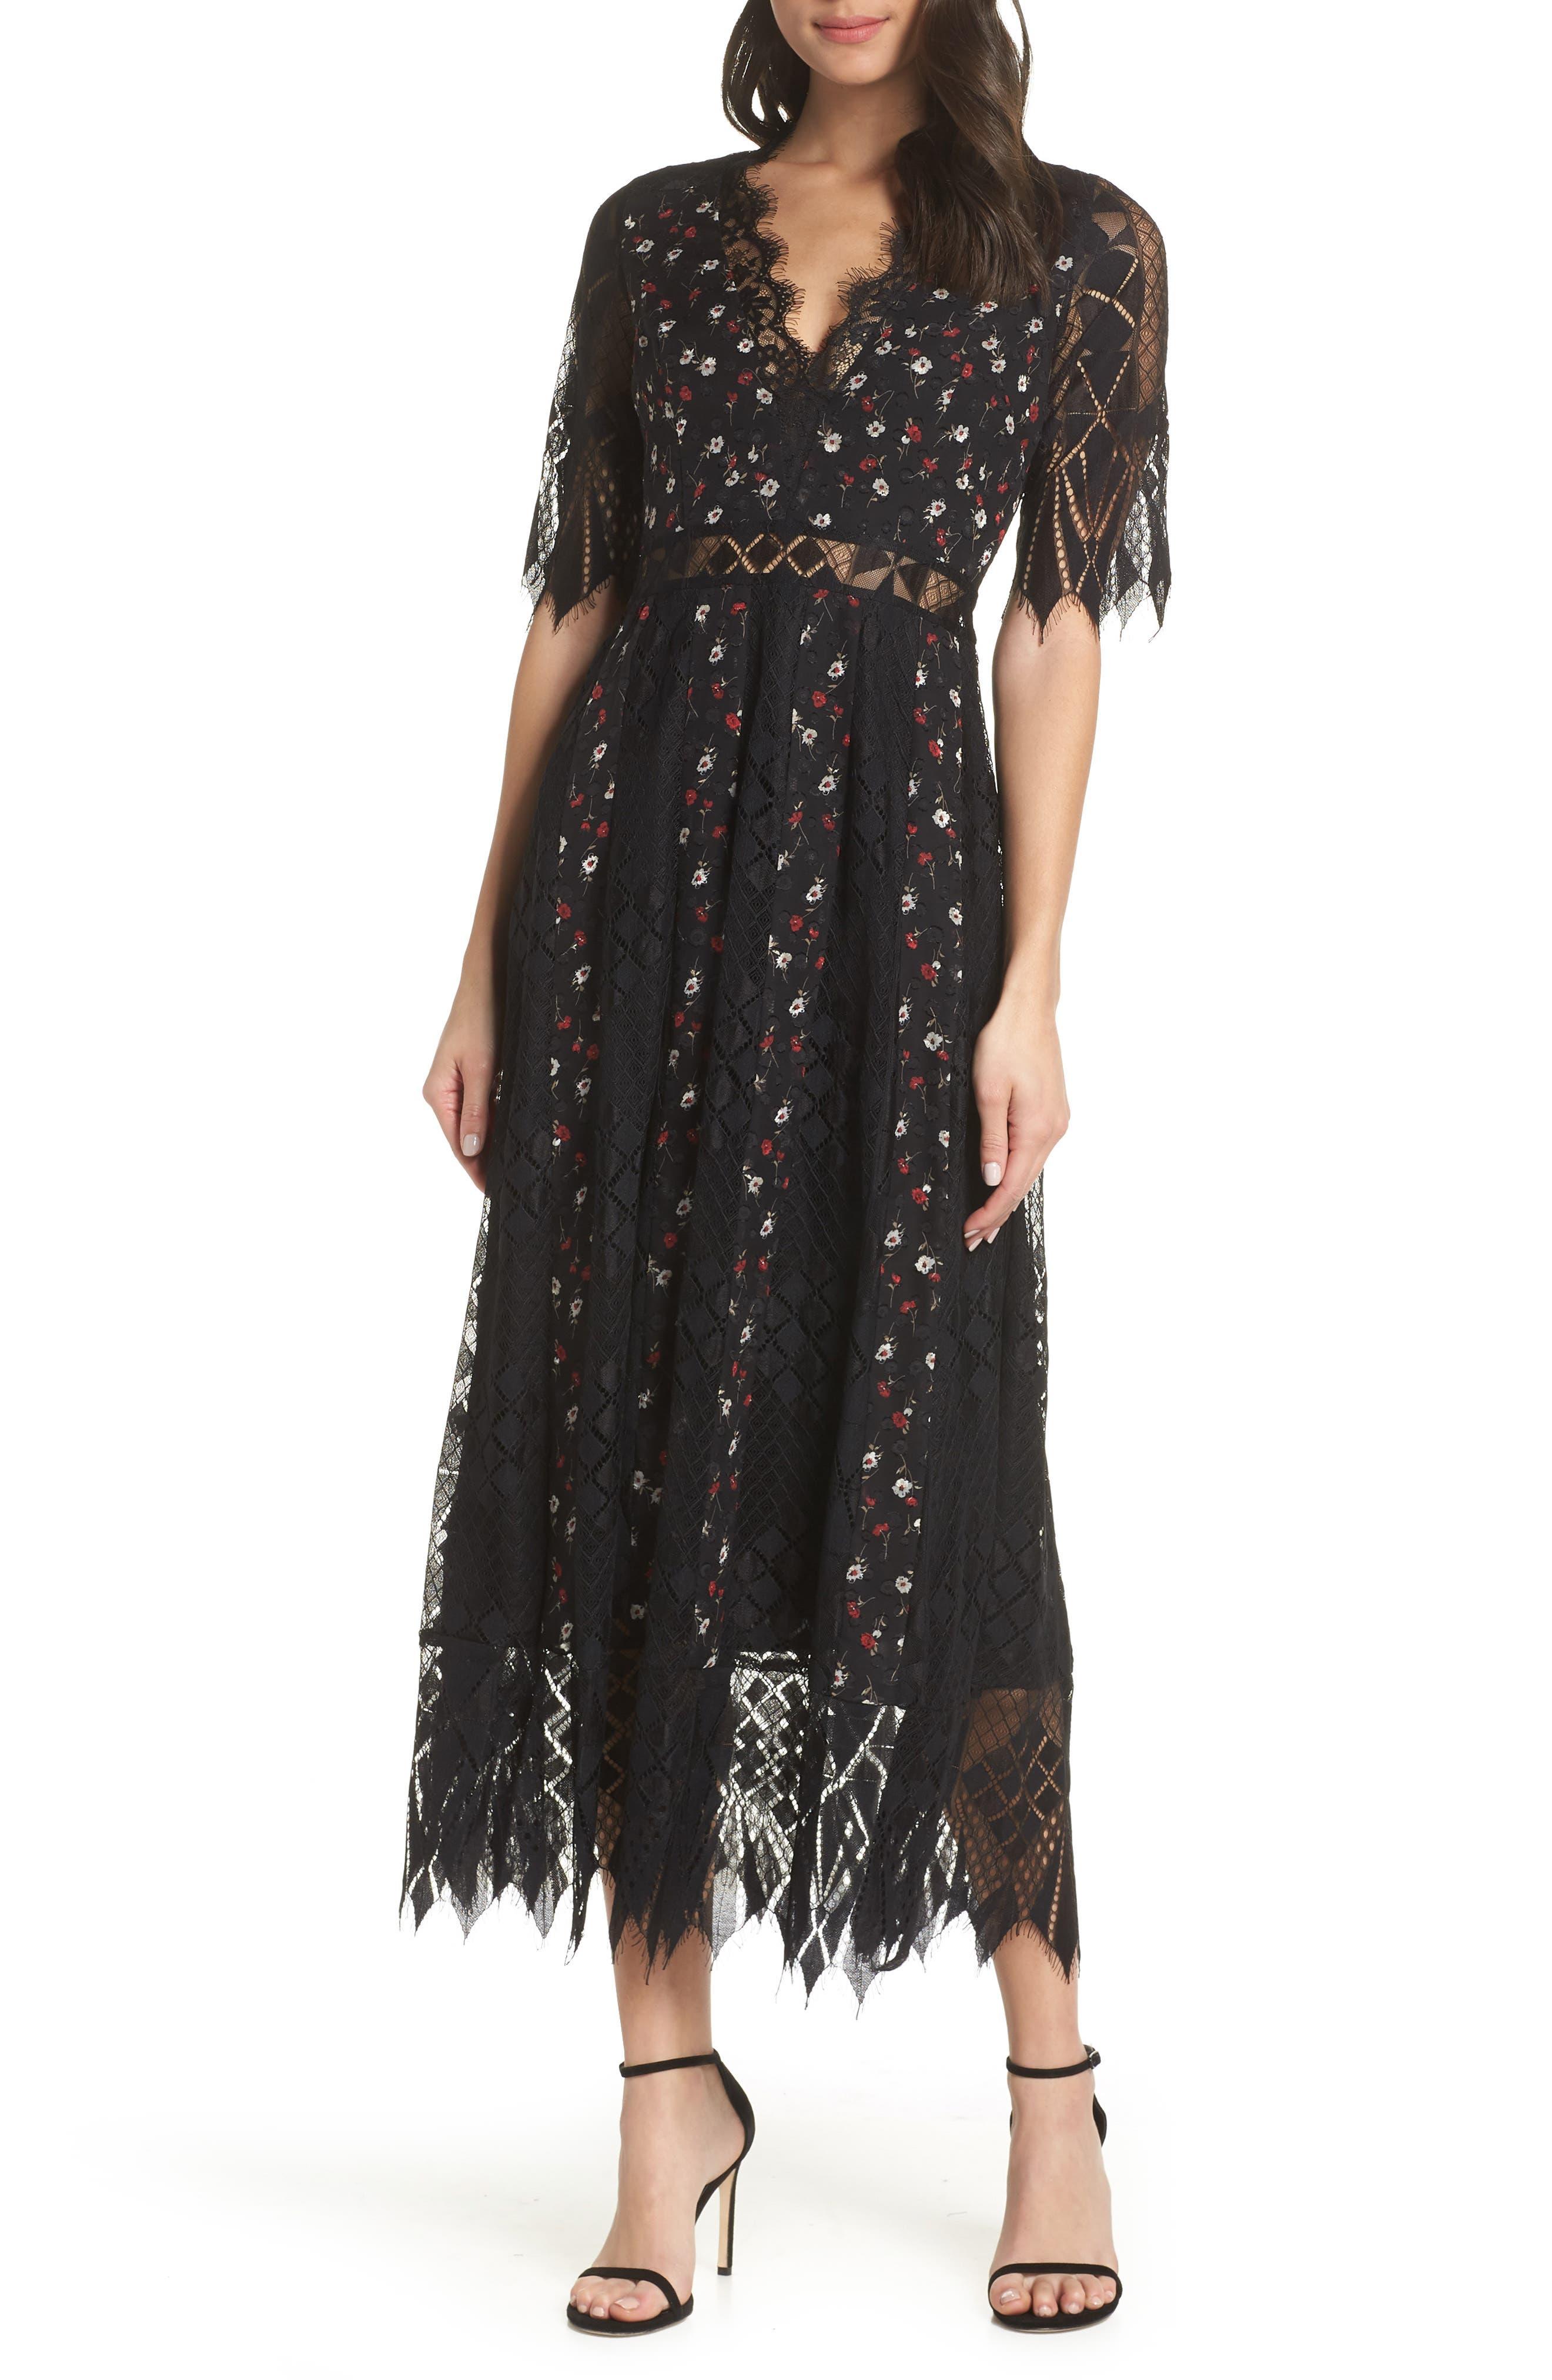 FOXIEDOX Josefine Lace & Clip Dot Tea Length Dress, Main, color, 001